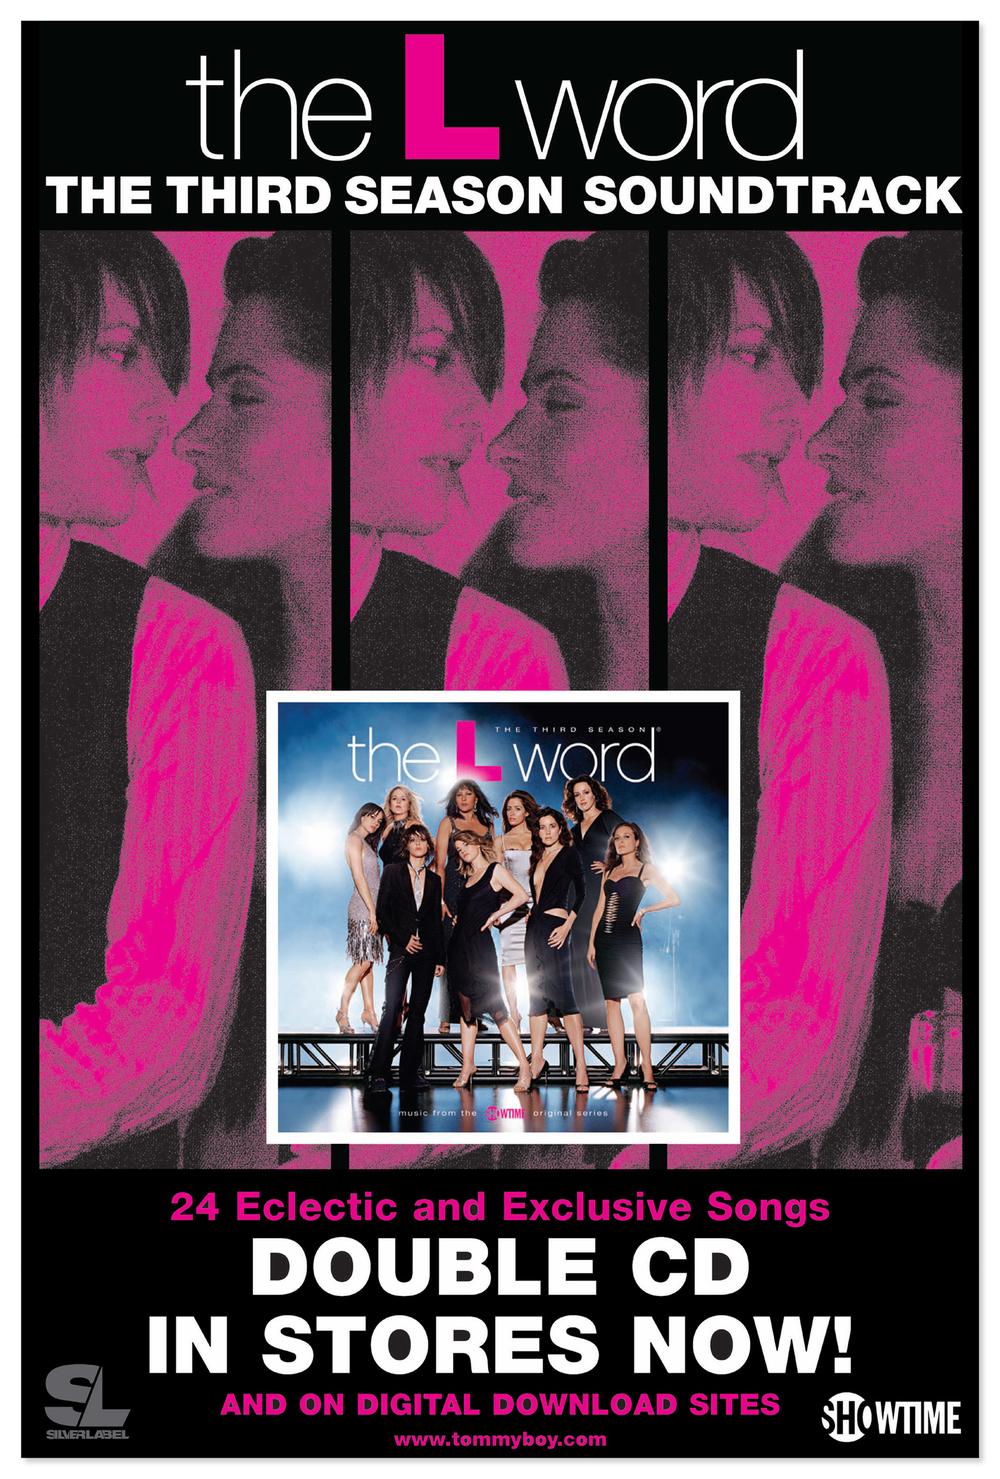 The L Word Season 3 soundtrack album poster